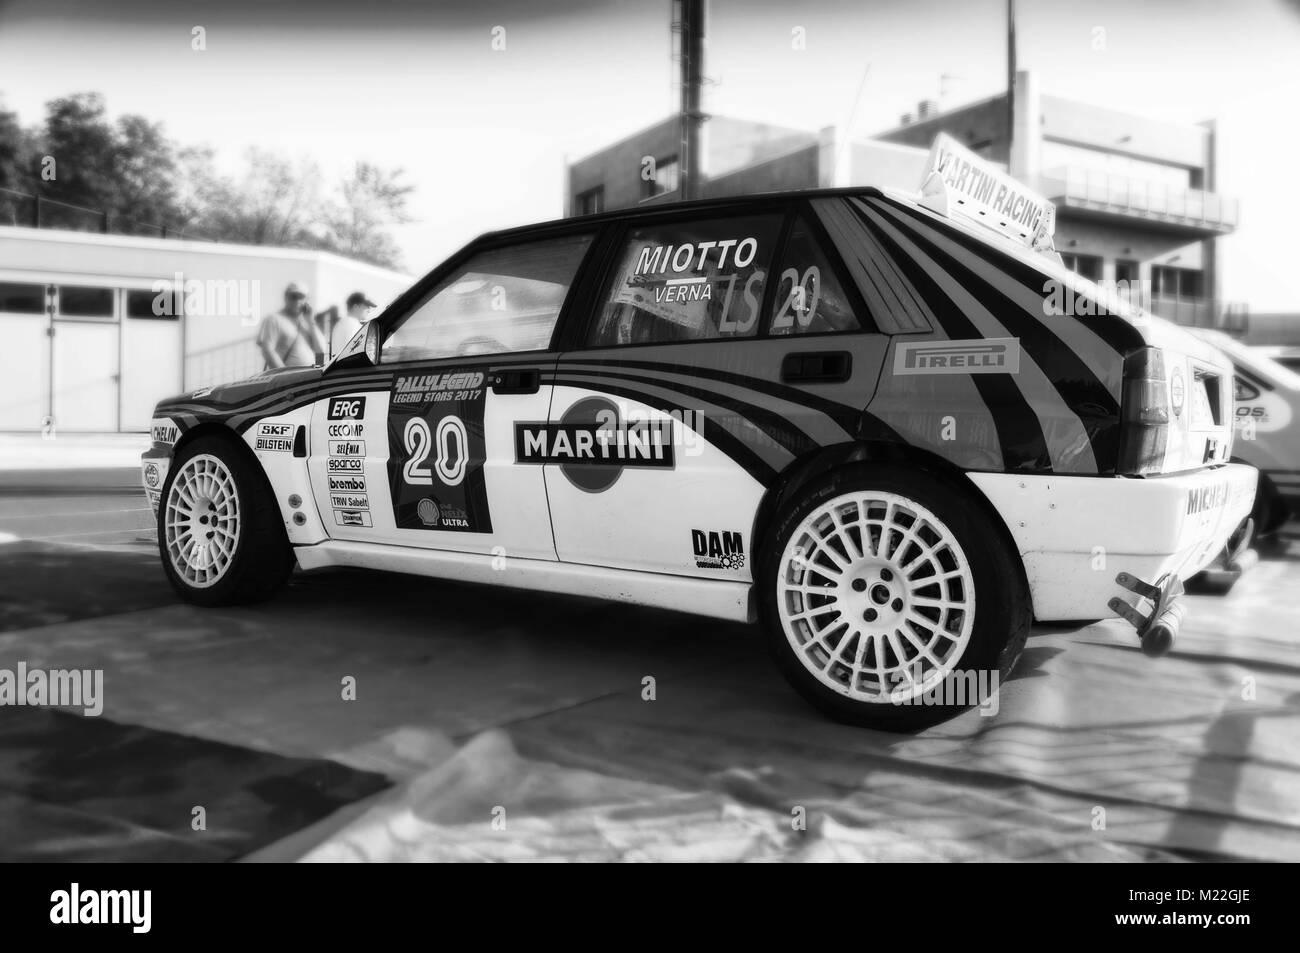 SANMARINO, SANMARINO - OTT 21, 2017 : LANCIA DELTA INT 16V 1994 in old racing car rally THE LEGEND 2017 the famous - Stock Image